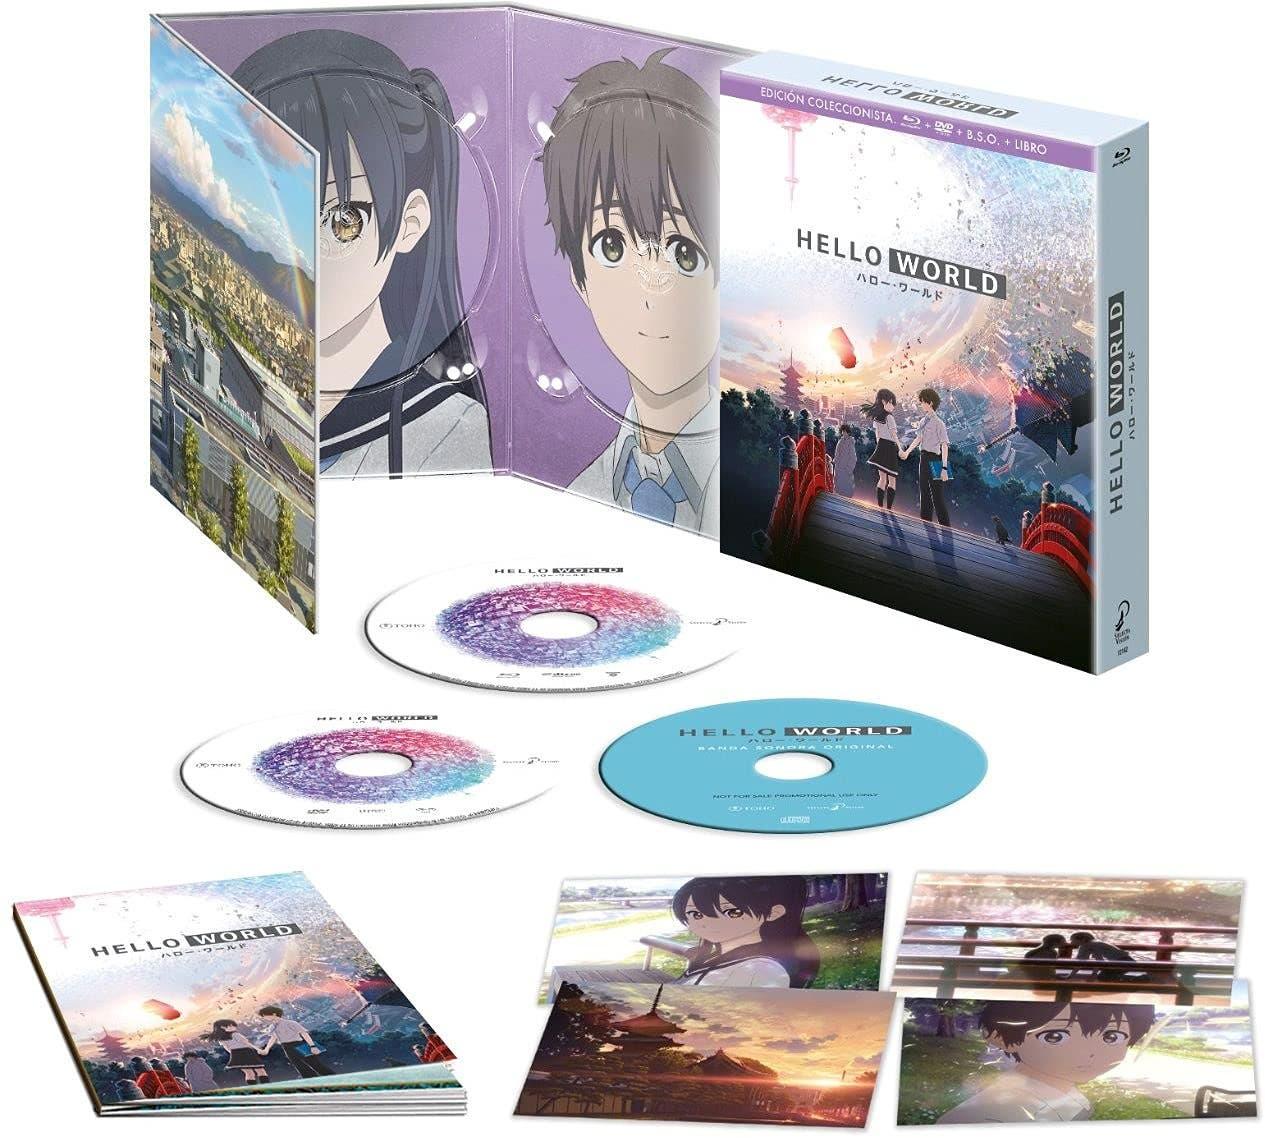 Hello World - Edición Coleccionista